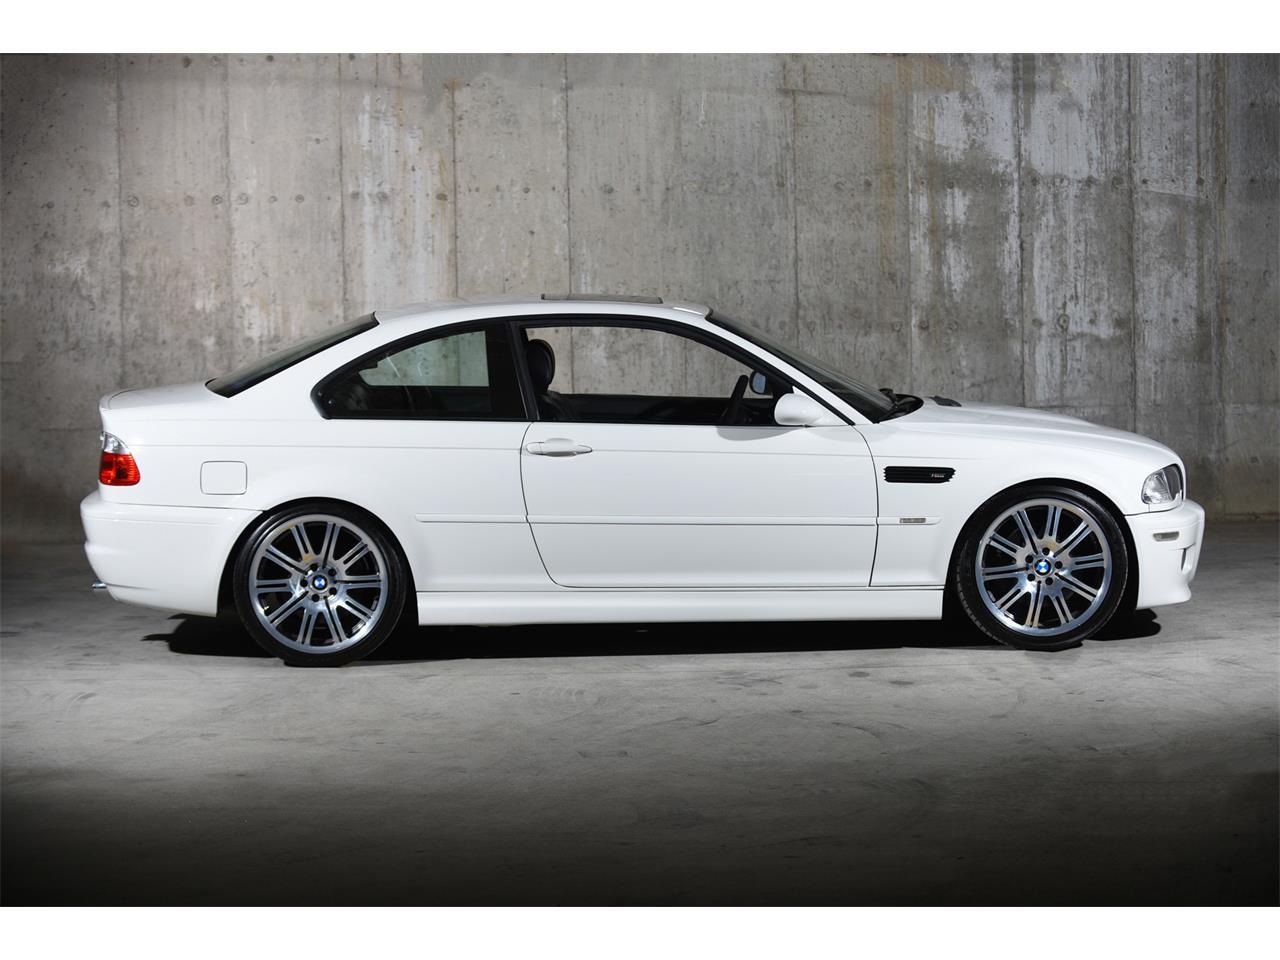 2003 bmw m3 for sale | classiccars | cc-1171201